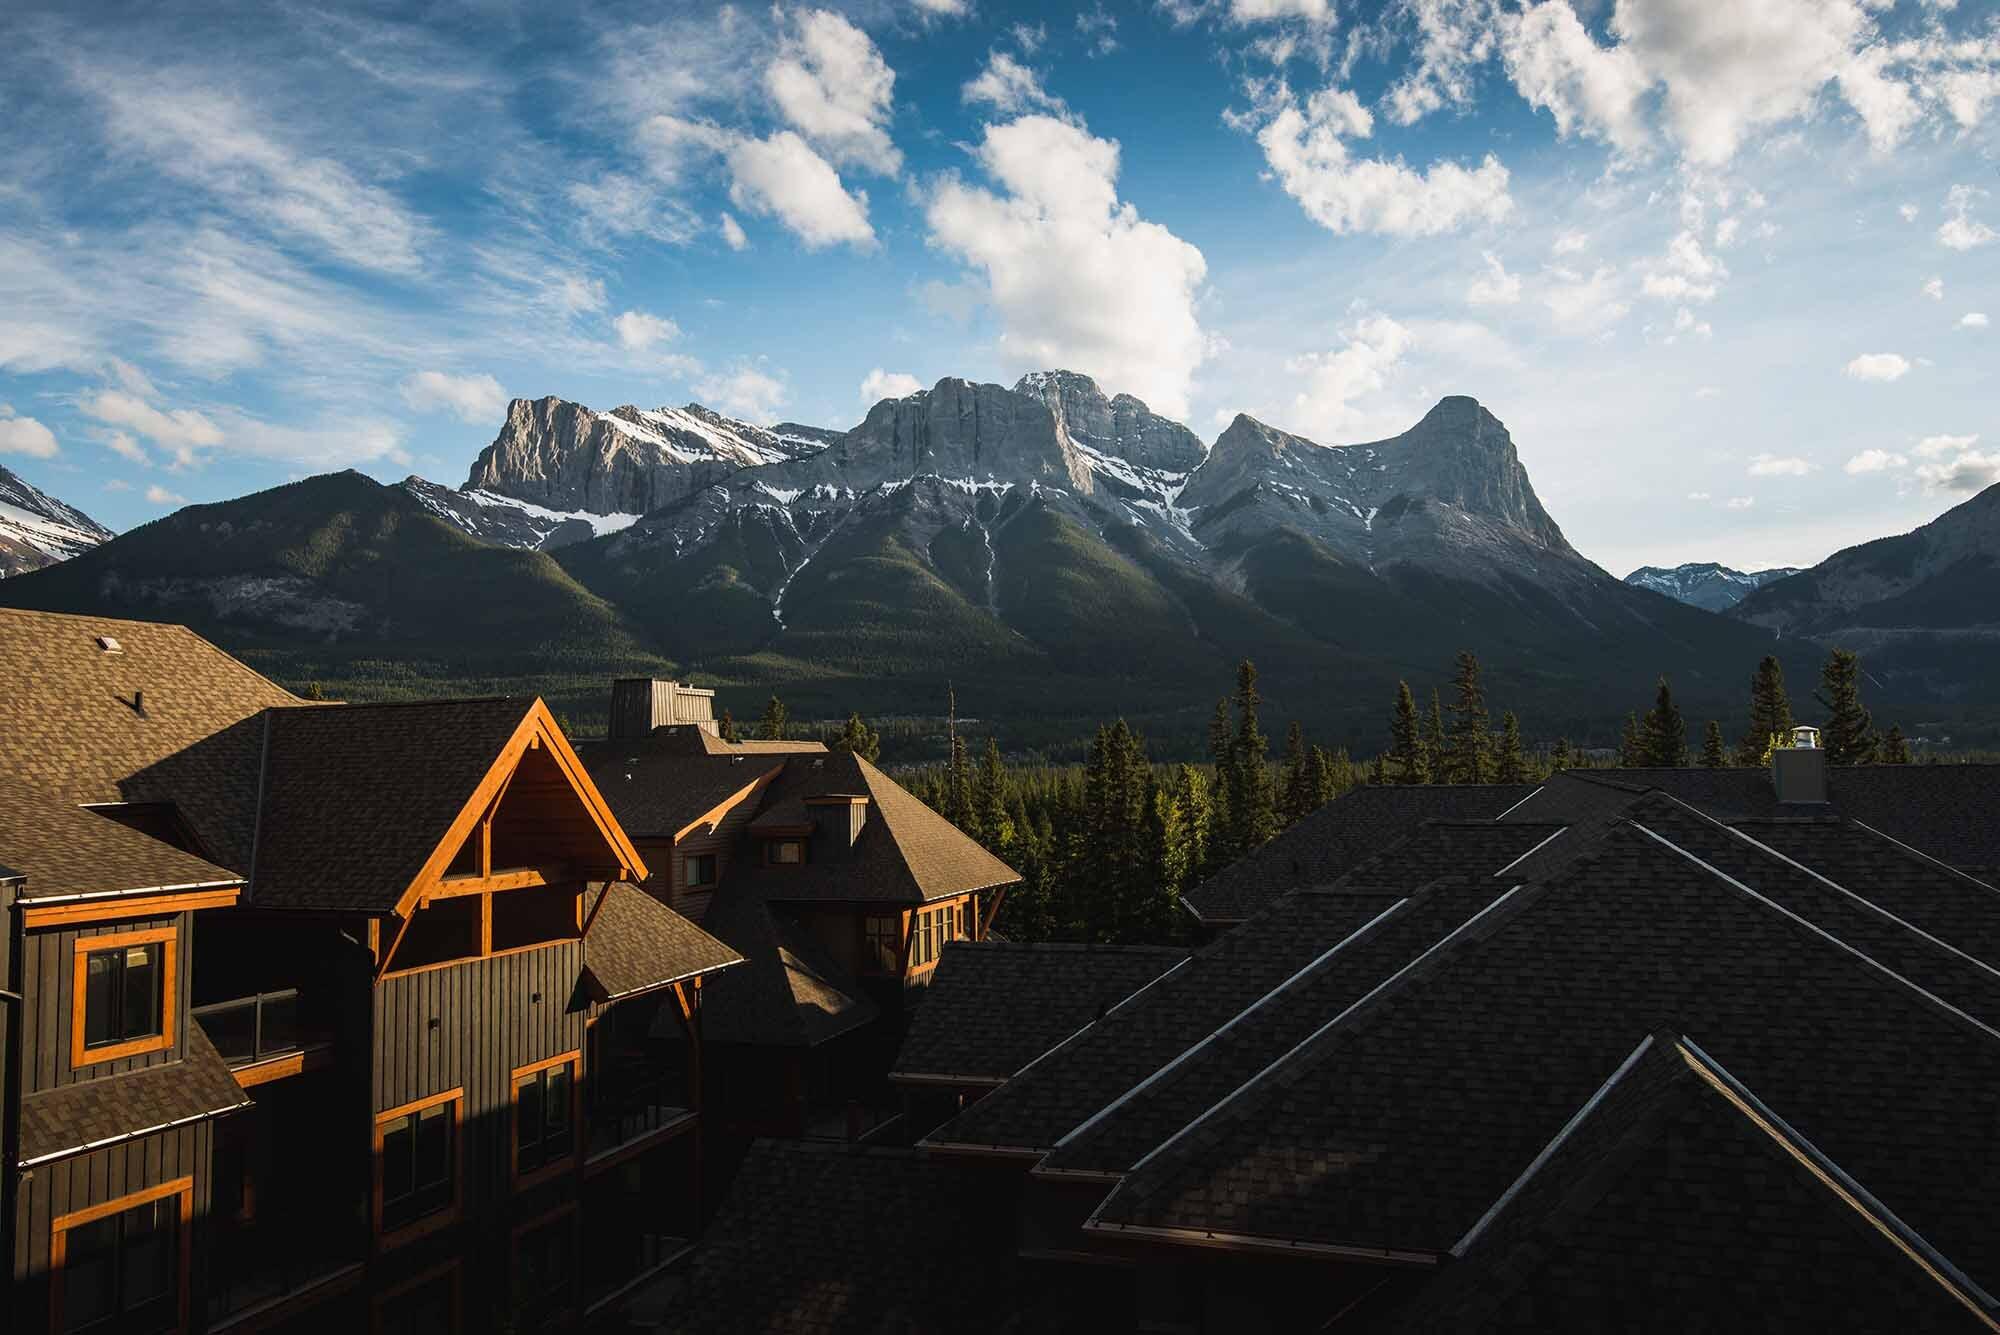 solara-resort-view-web-low.jpg